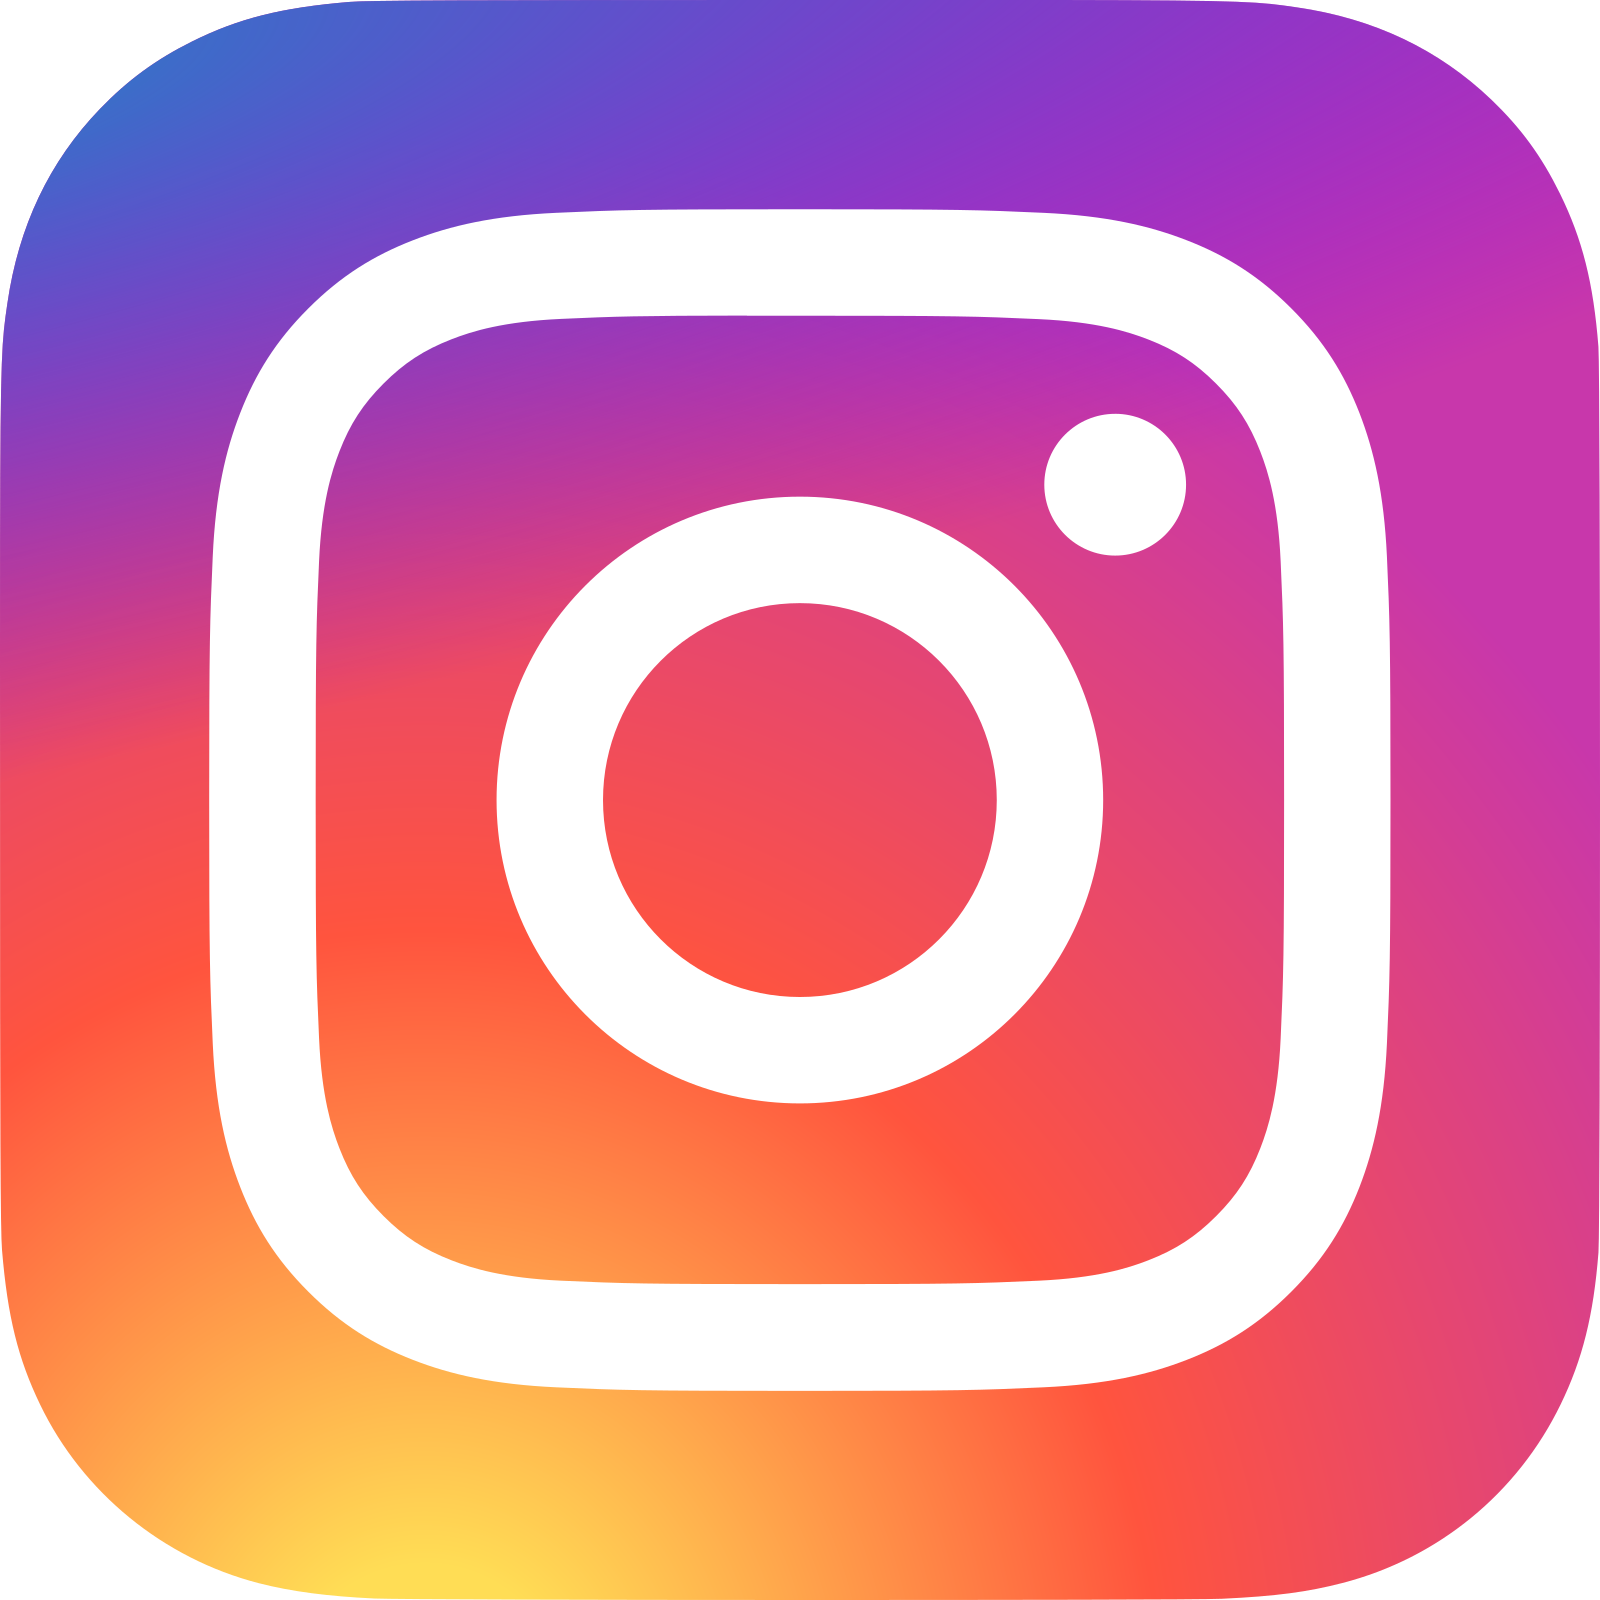 CIW Instagram